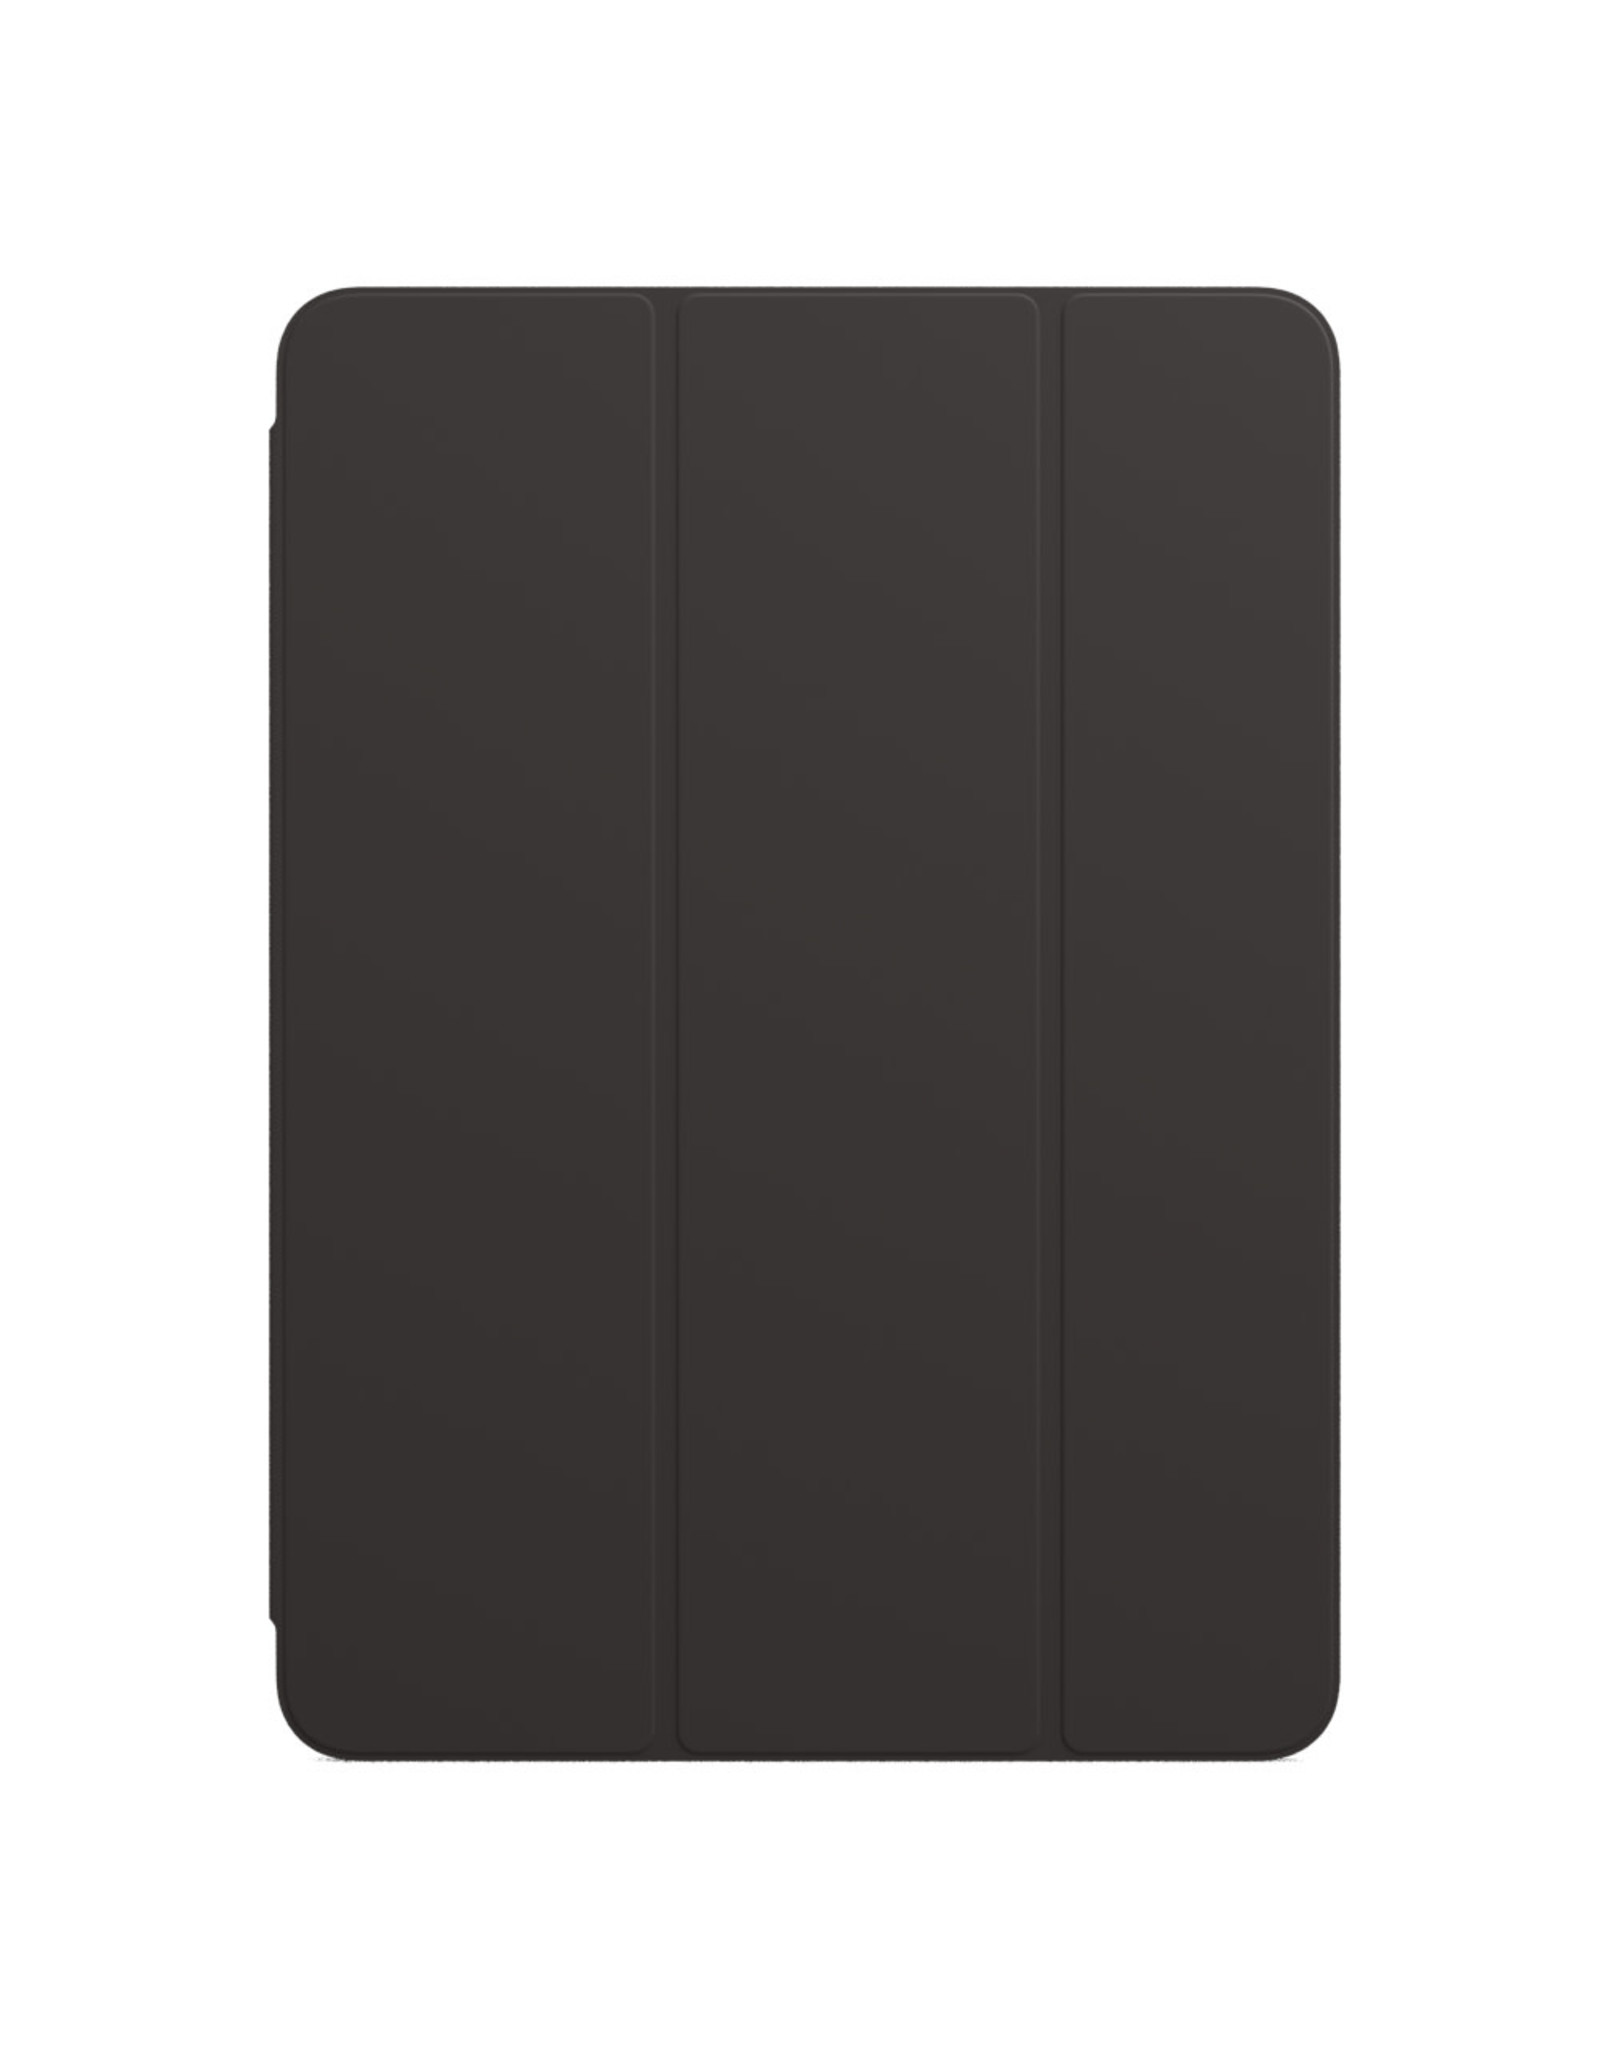 Apple Apple Smart Folio for iPad Pro 11-inch (3rd generation) - Black